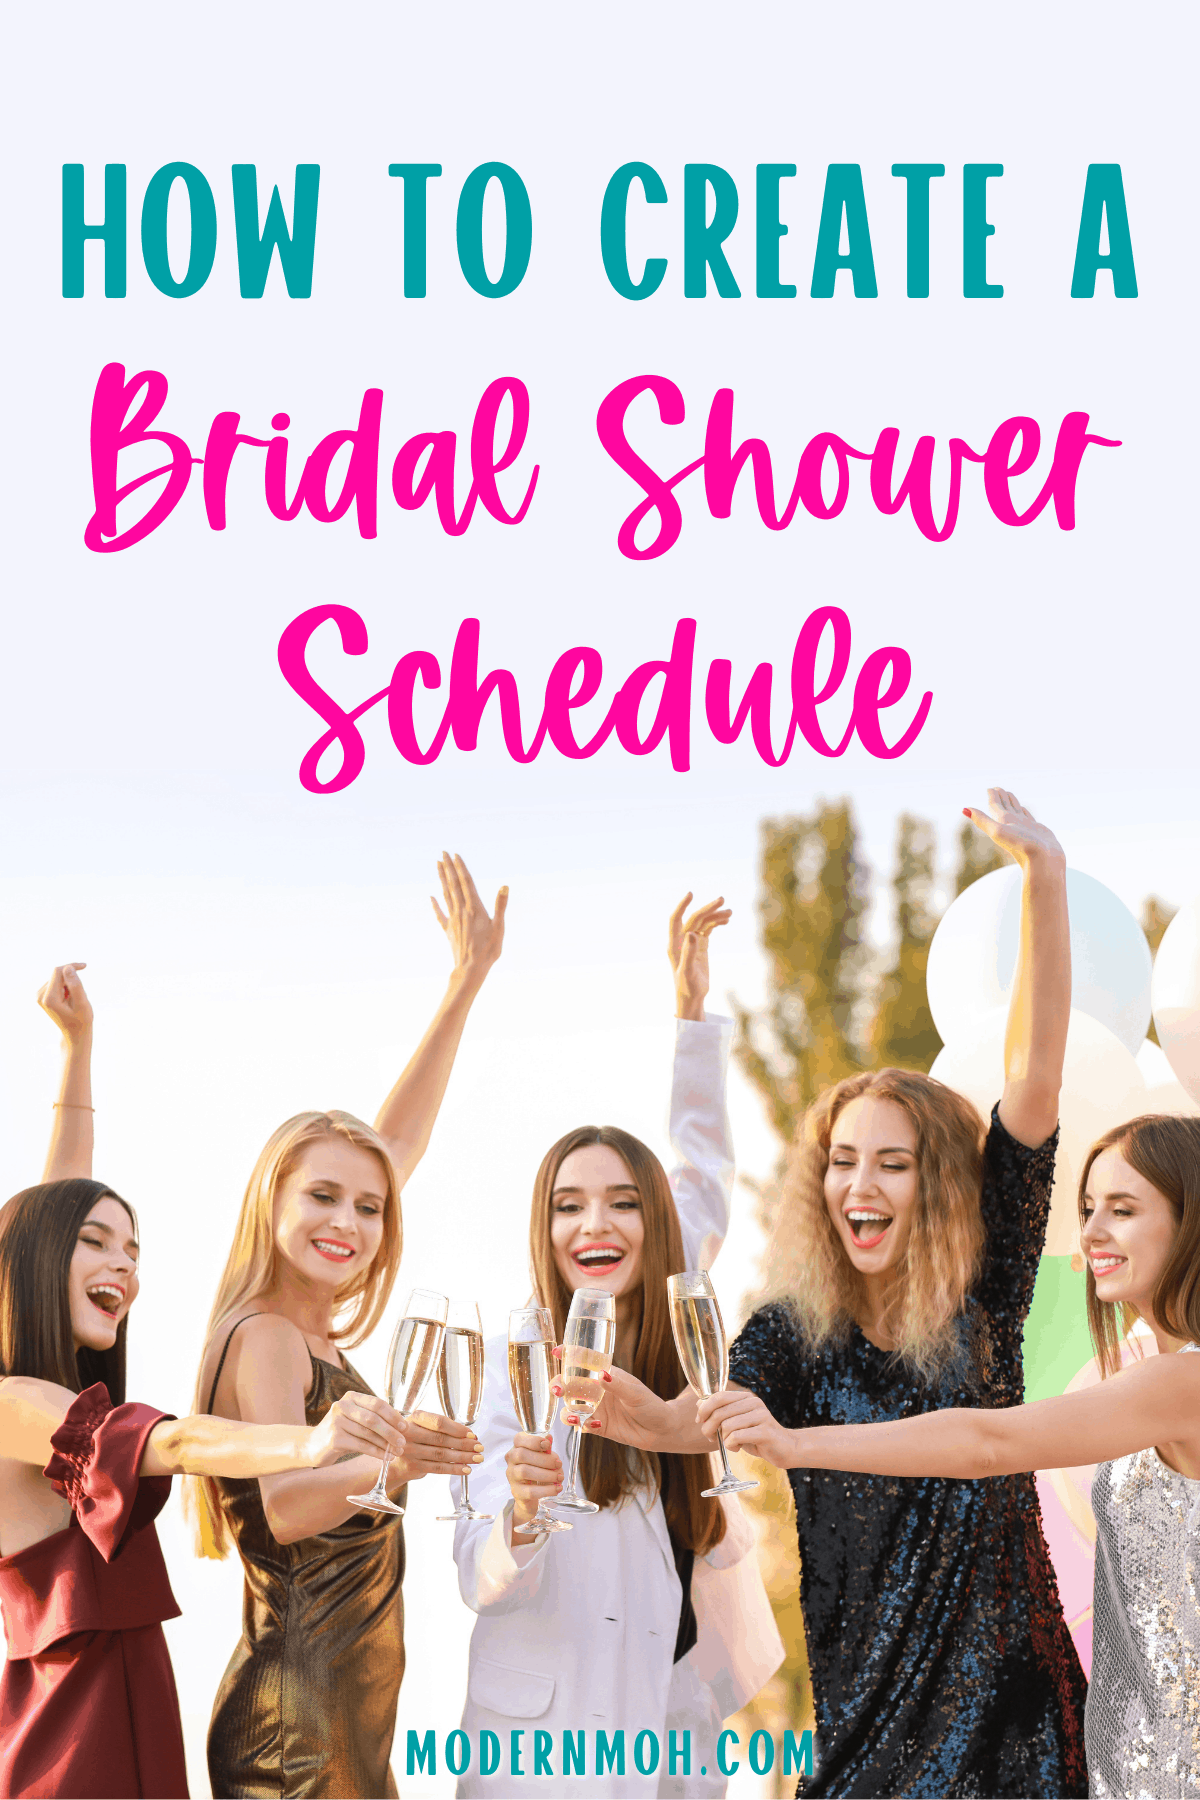 Bridal Shower Schedule + Order of Events